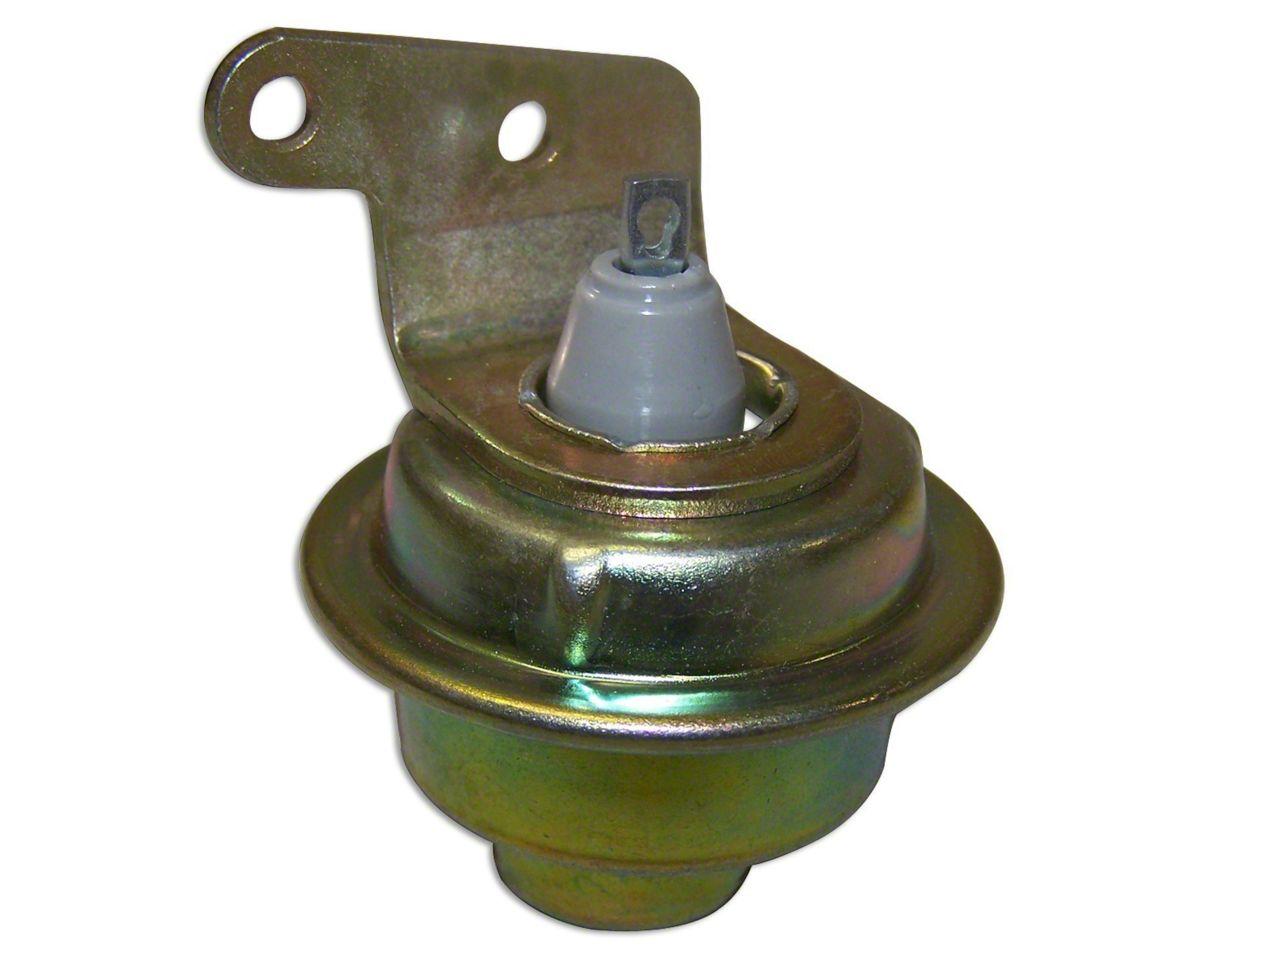 Vintage Choke Diaphragm (87-90 2.5L Jeep Wrangler YJ)